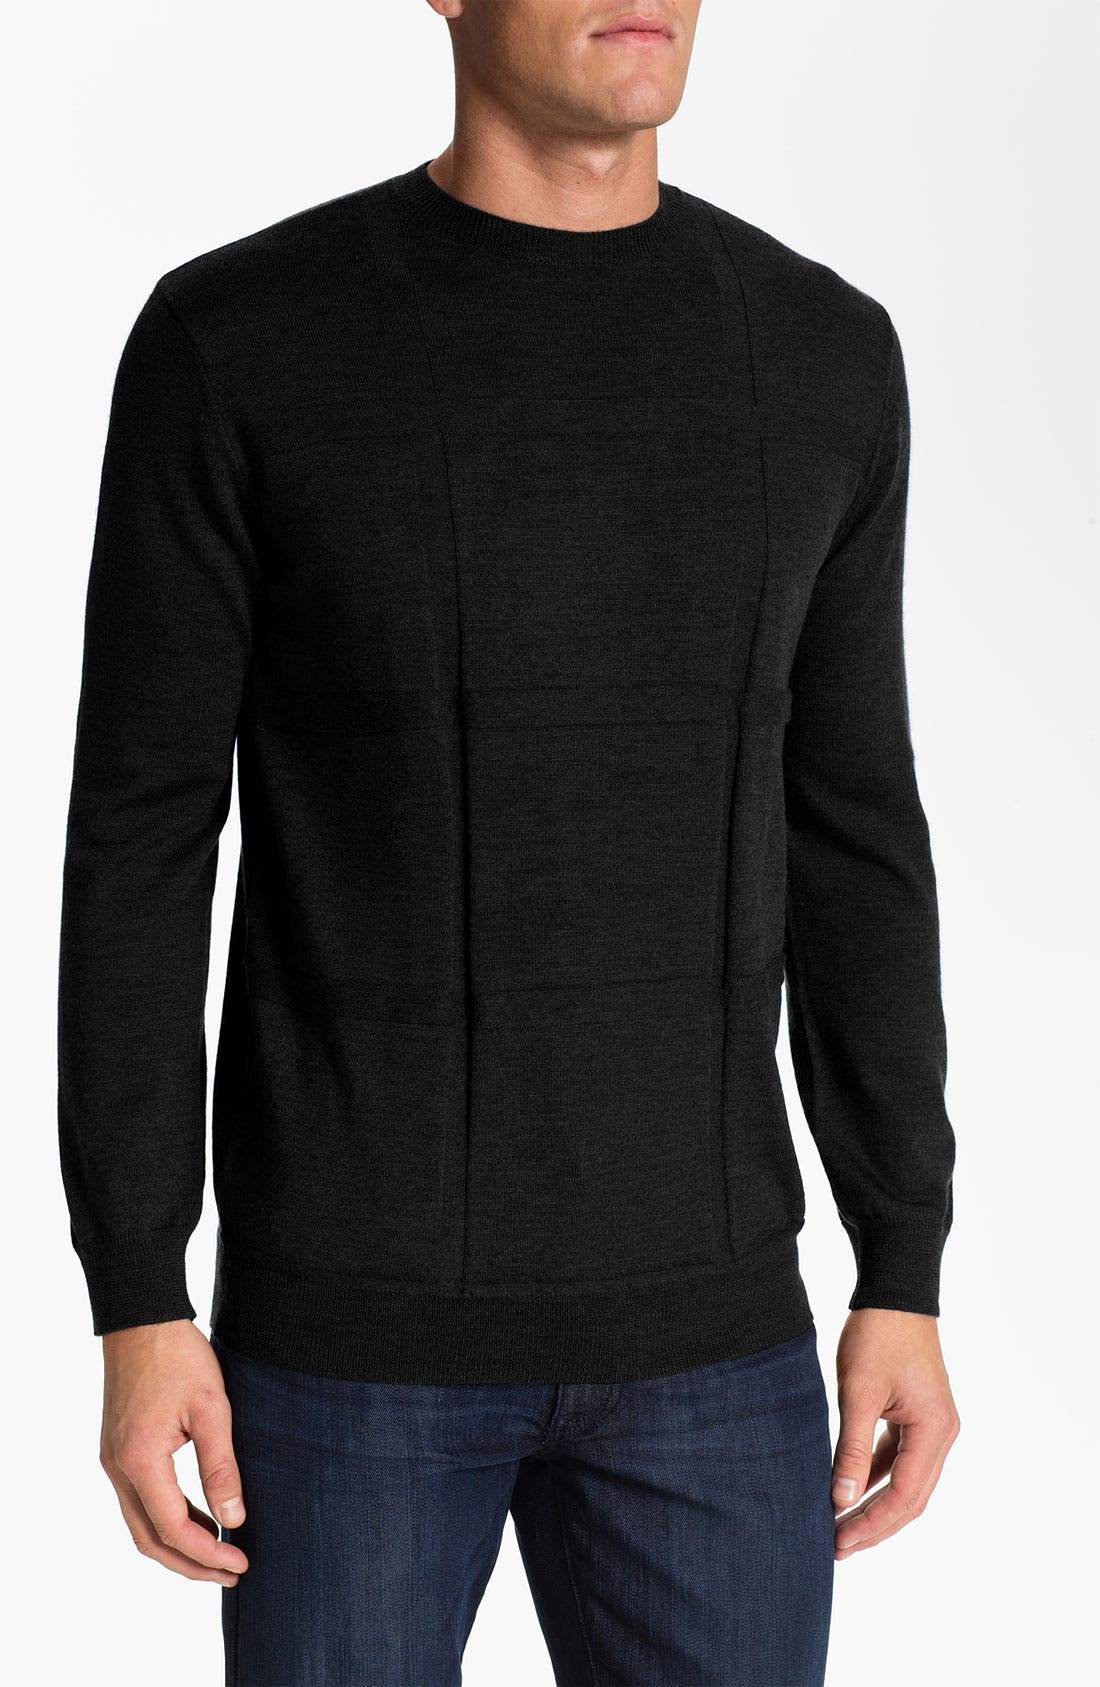 Main Image - Bugatchi Uomo Merino Wool Crewneck Sweater